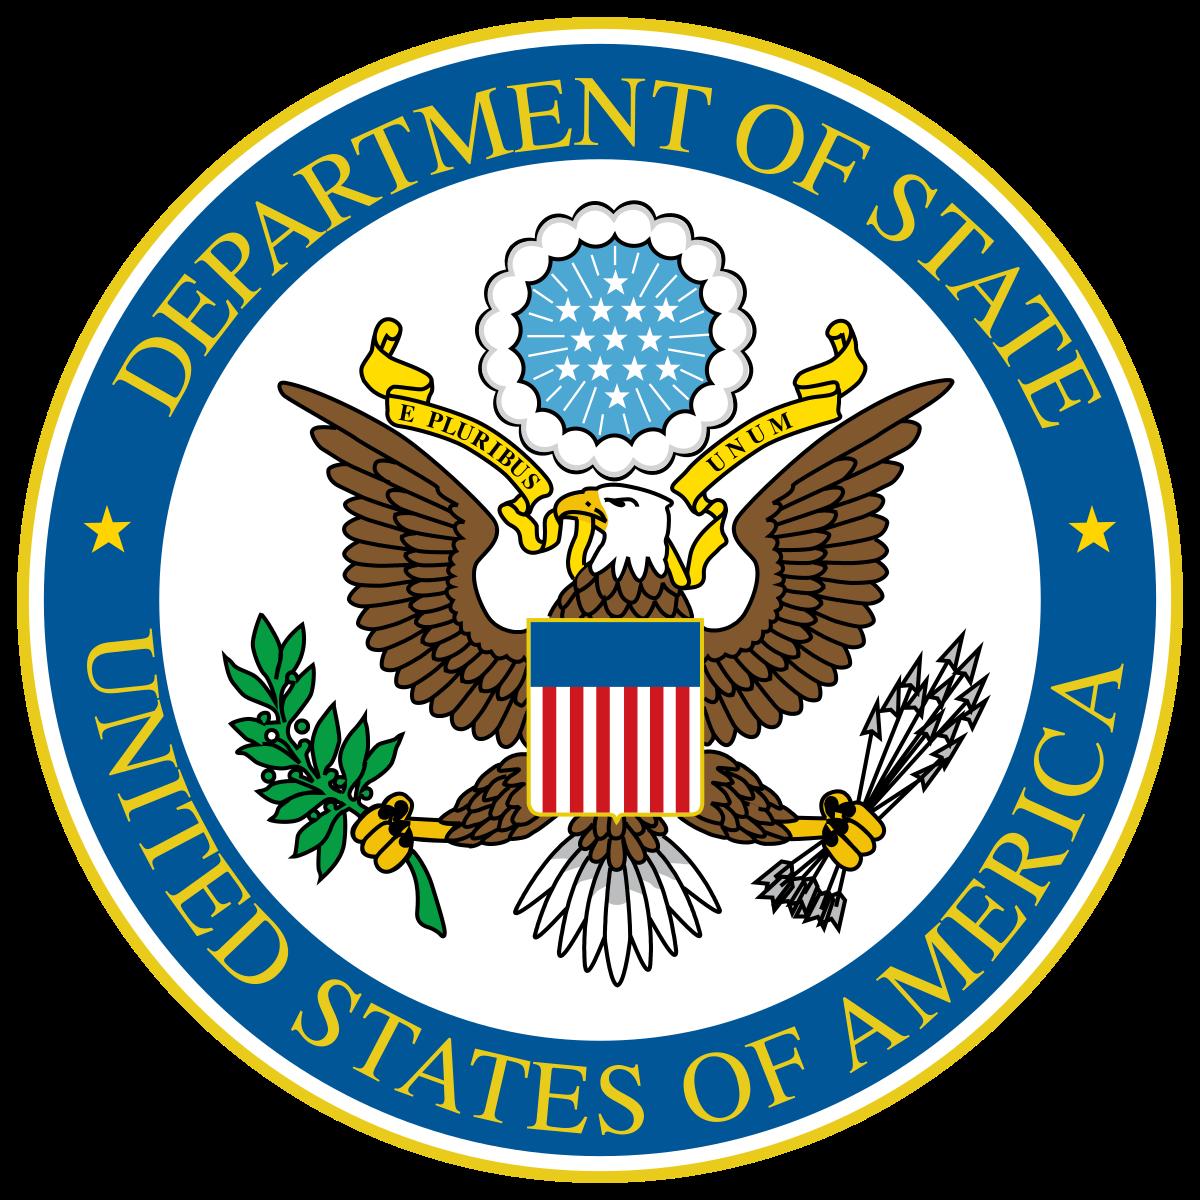 United States Secretary of State.